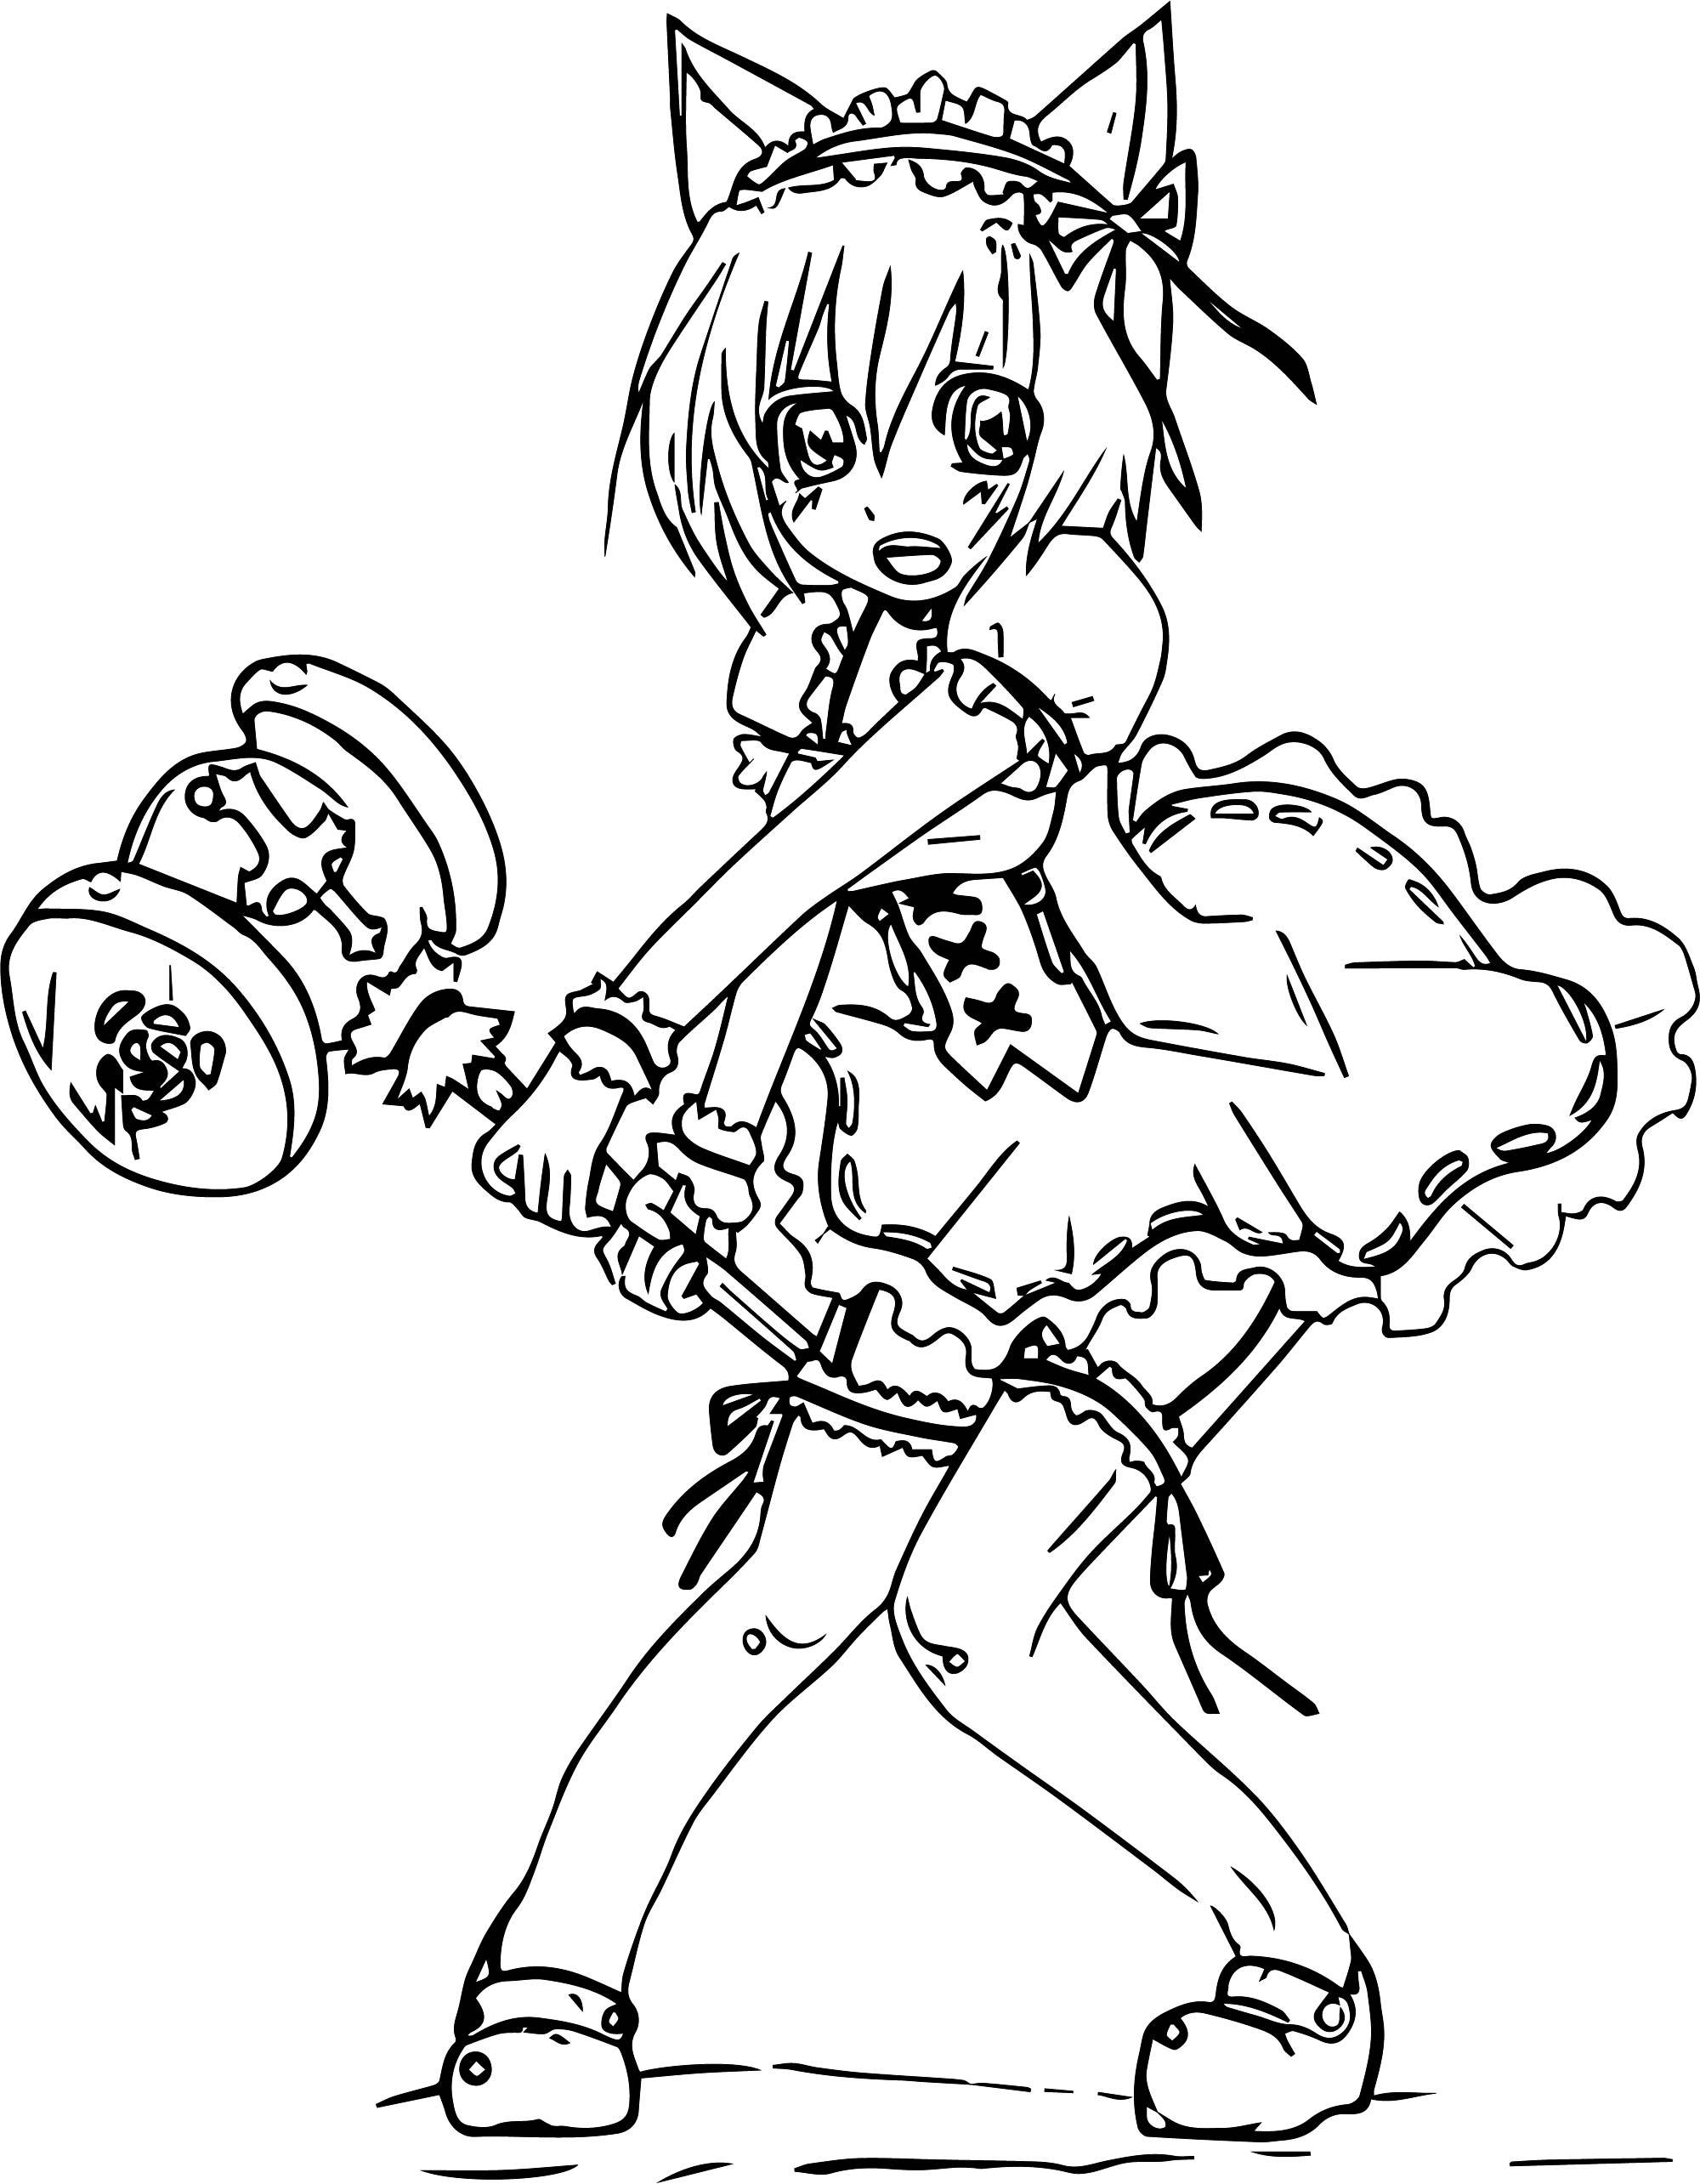 Amy Rose Manga Coloring Page | Wecoloringpage